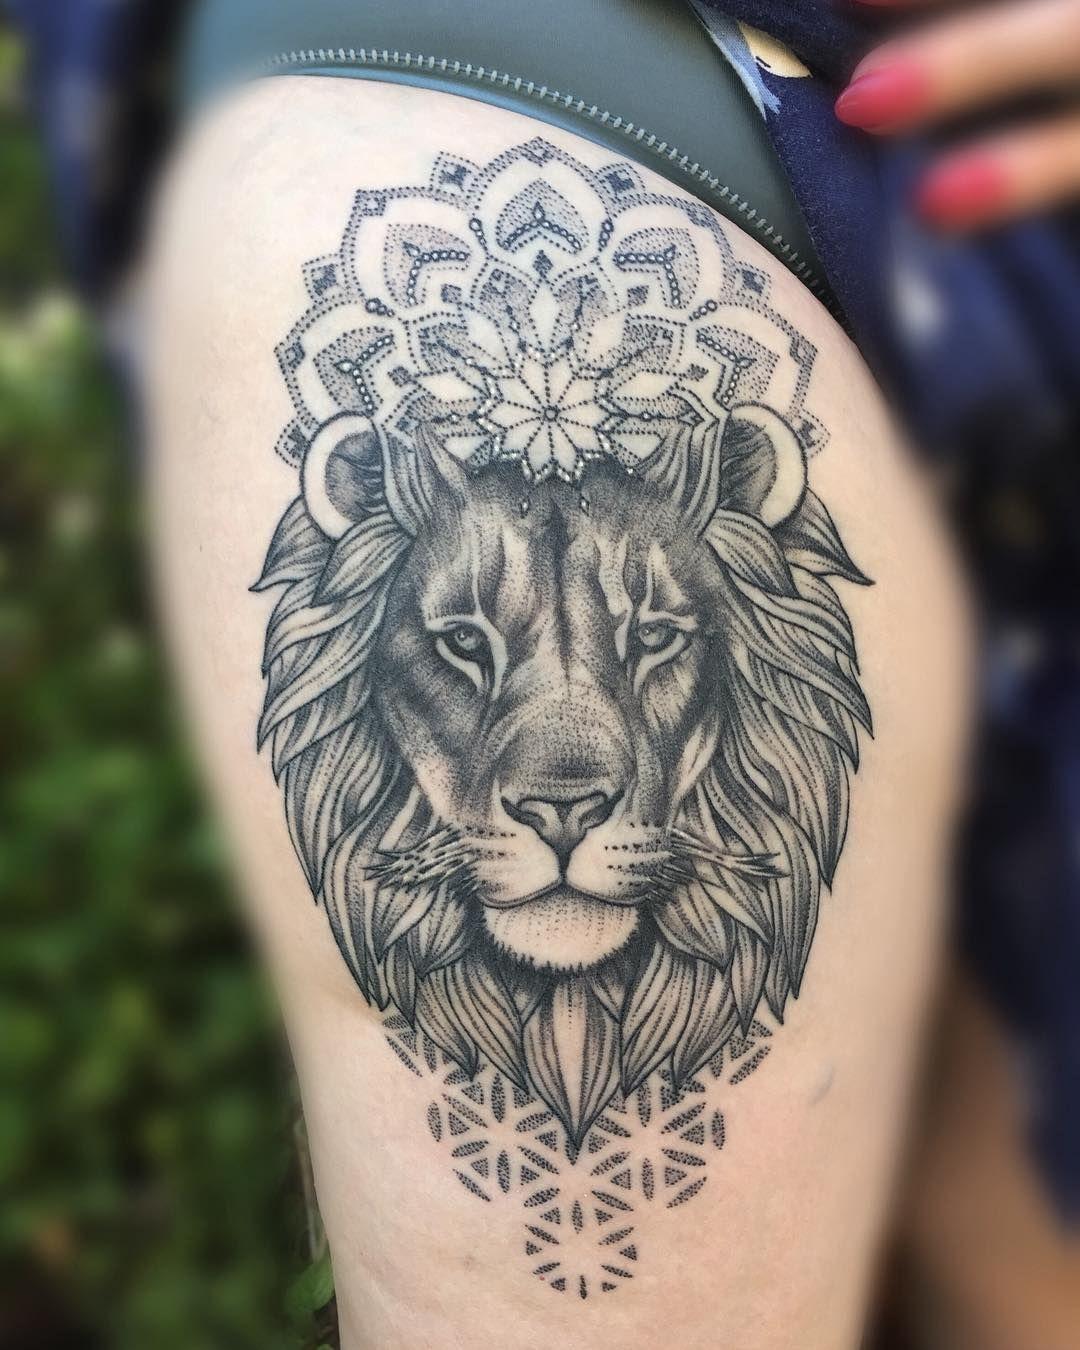 ec32730d2abd4 1 month healed 🌿 More animals please ! 🦁 #miletune Mandala Lion Tattoo,  Butterfly